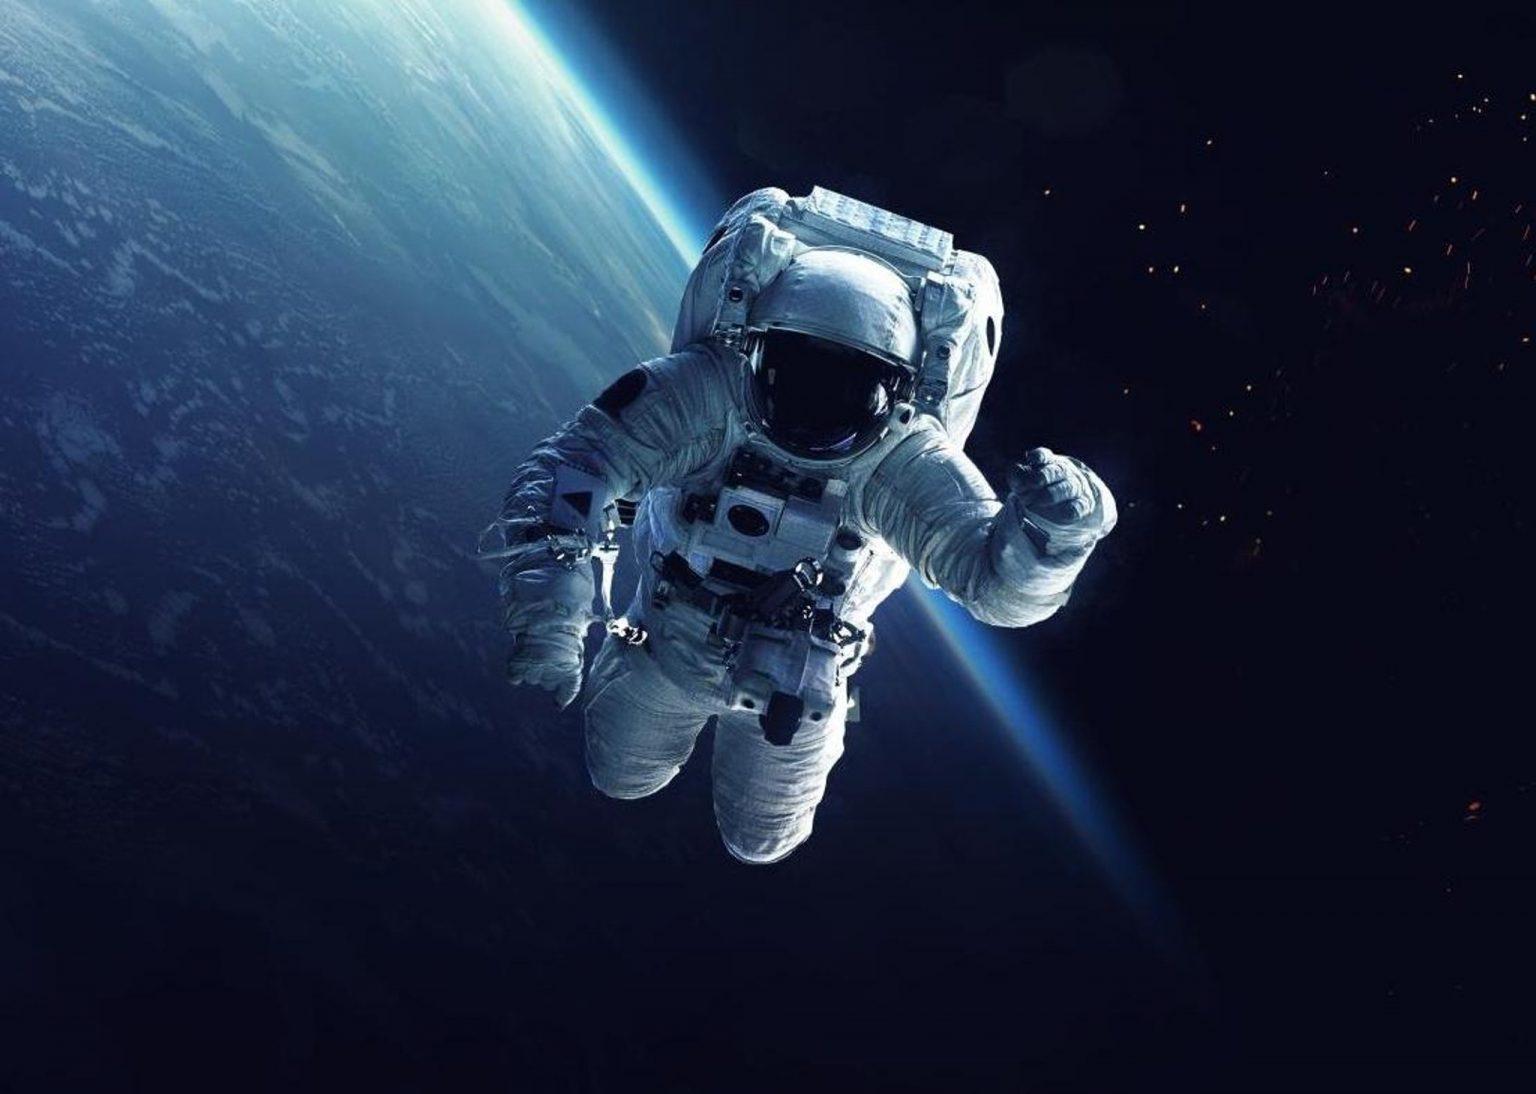 European Space Agency to hire first disabled astronaut | తొలి వికలాంగ వ్యోమగామిని నియమించనున్న యూరోపియన్ స్పేస్ ఏజెన్సీ |_40.1